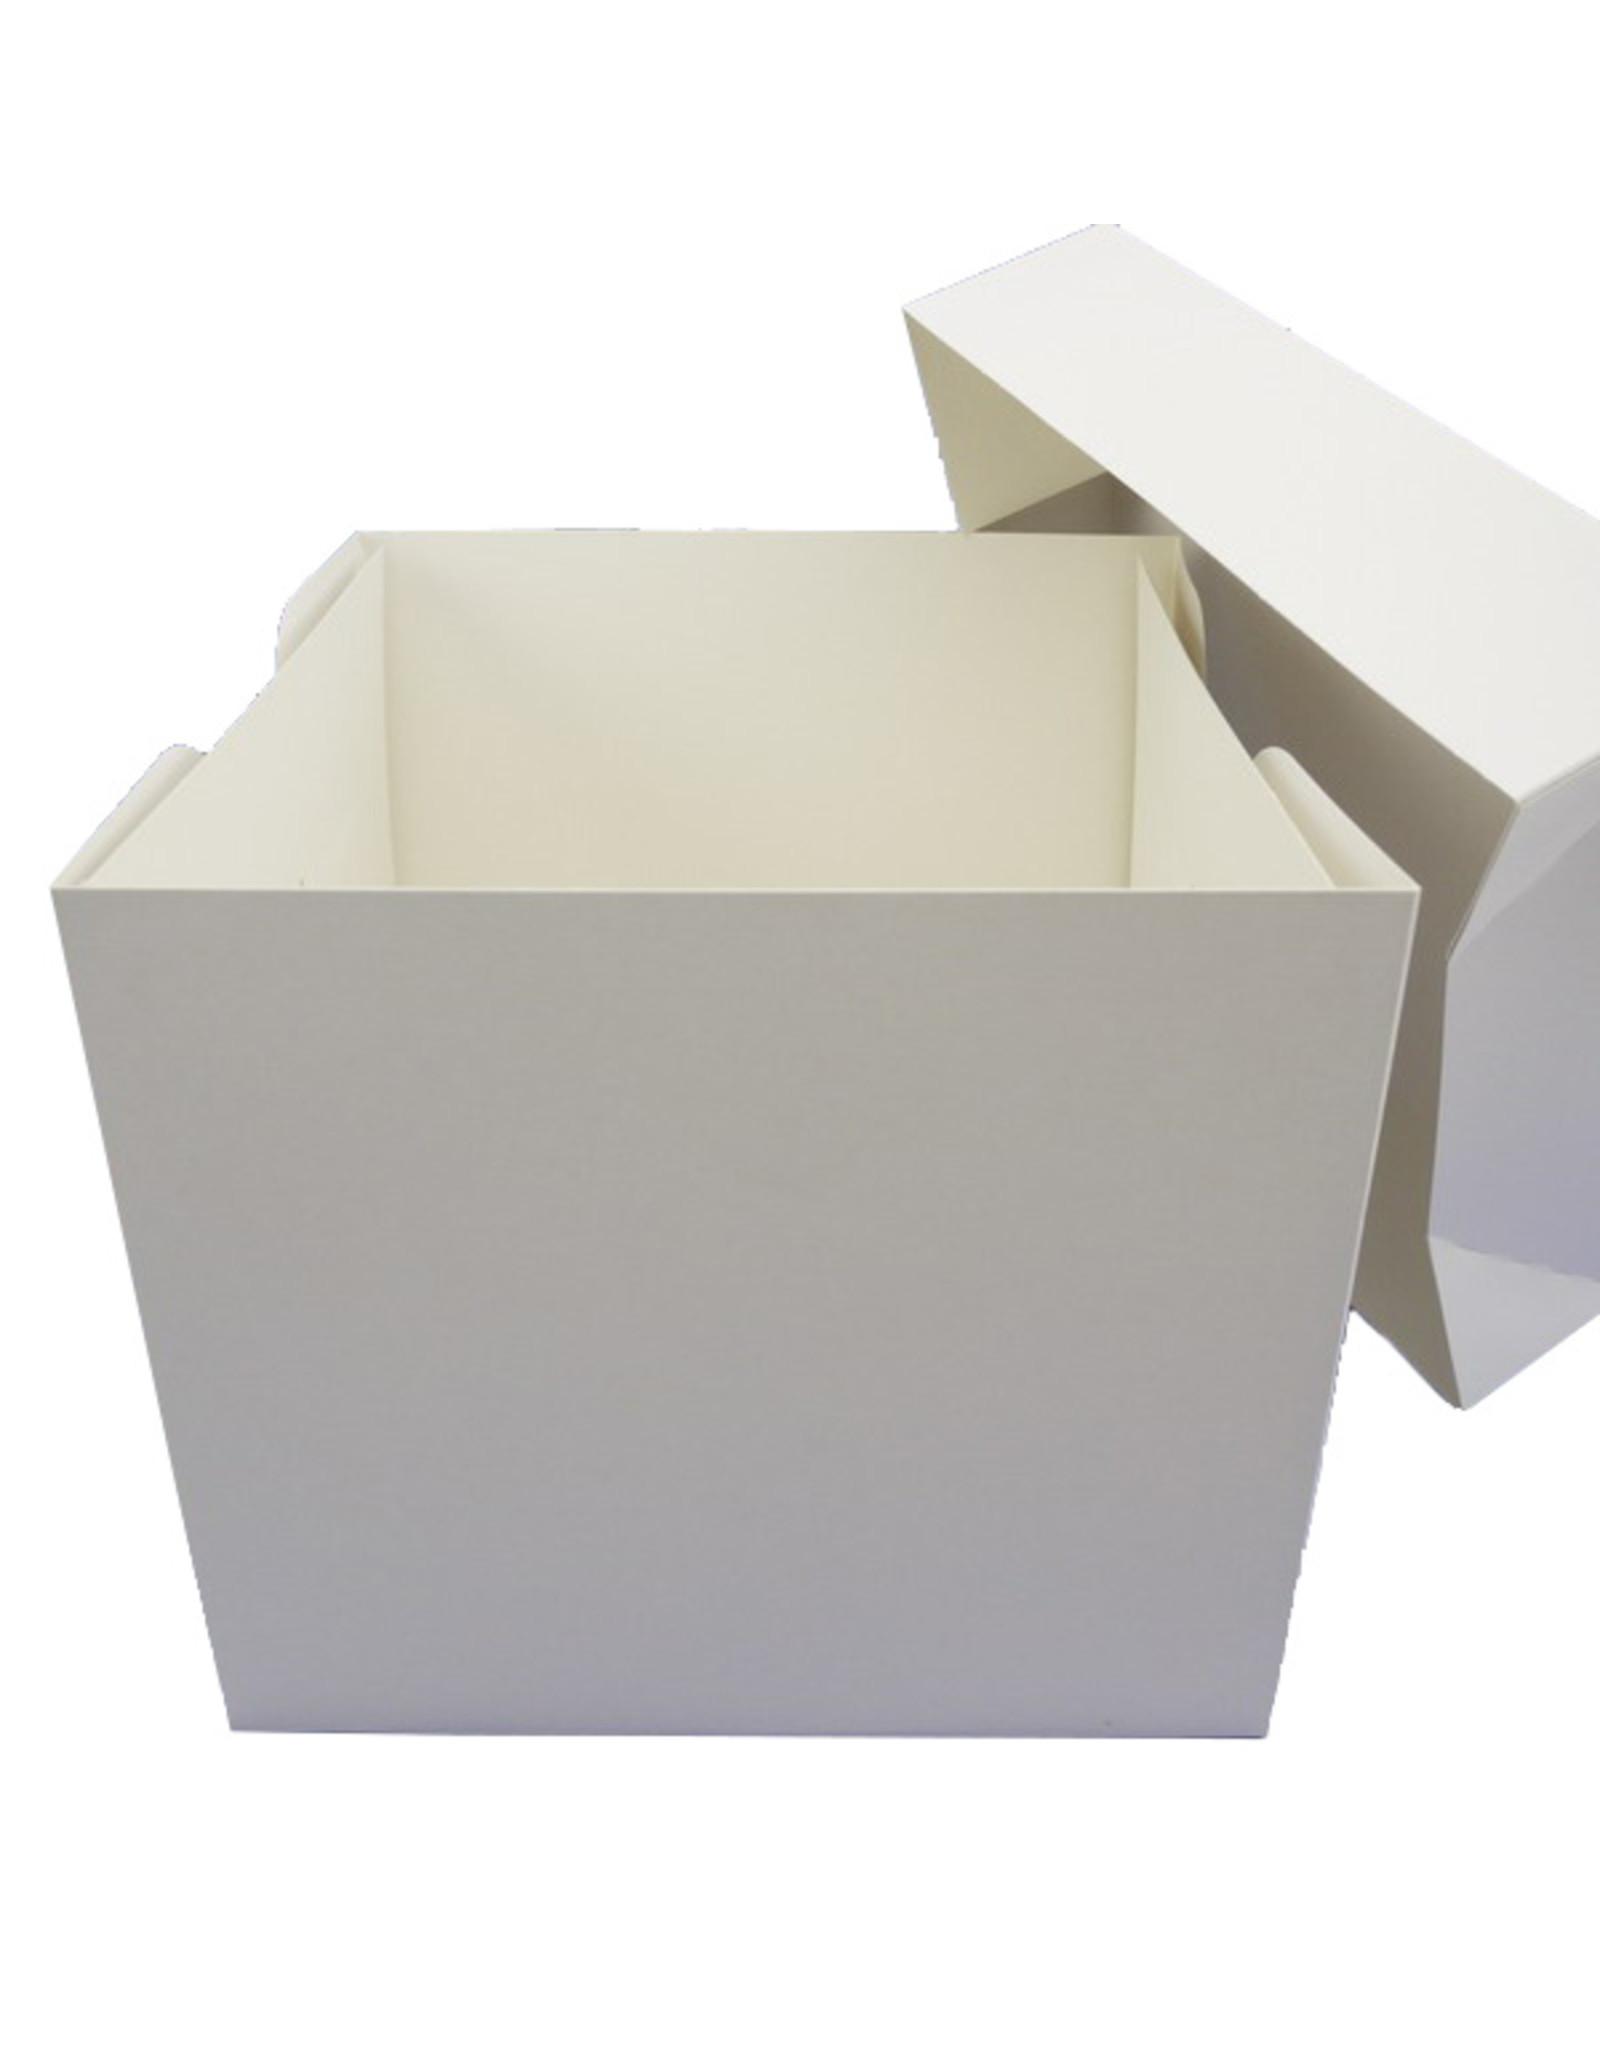 Tall cake box - 28 x 28 x 25 cm (per 50 pieces)